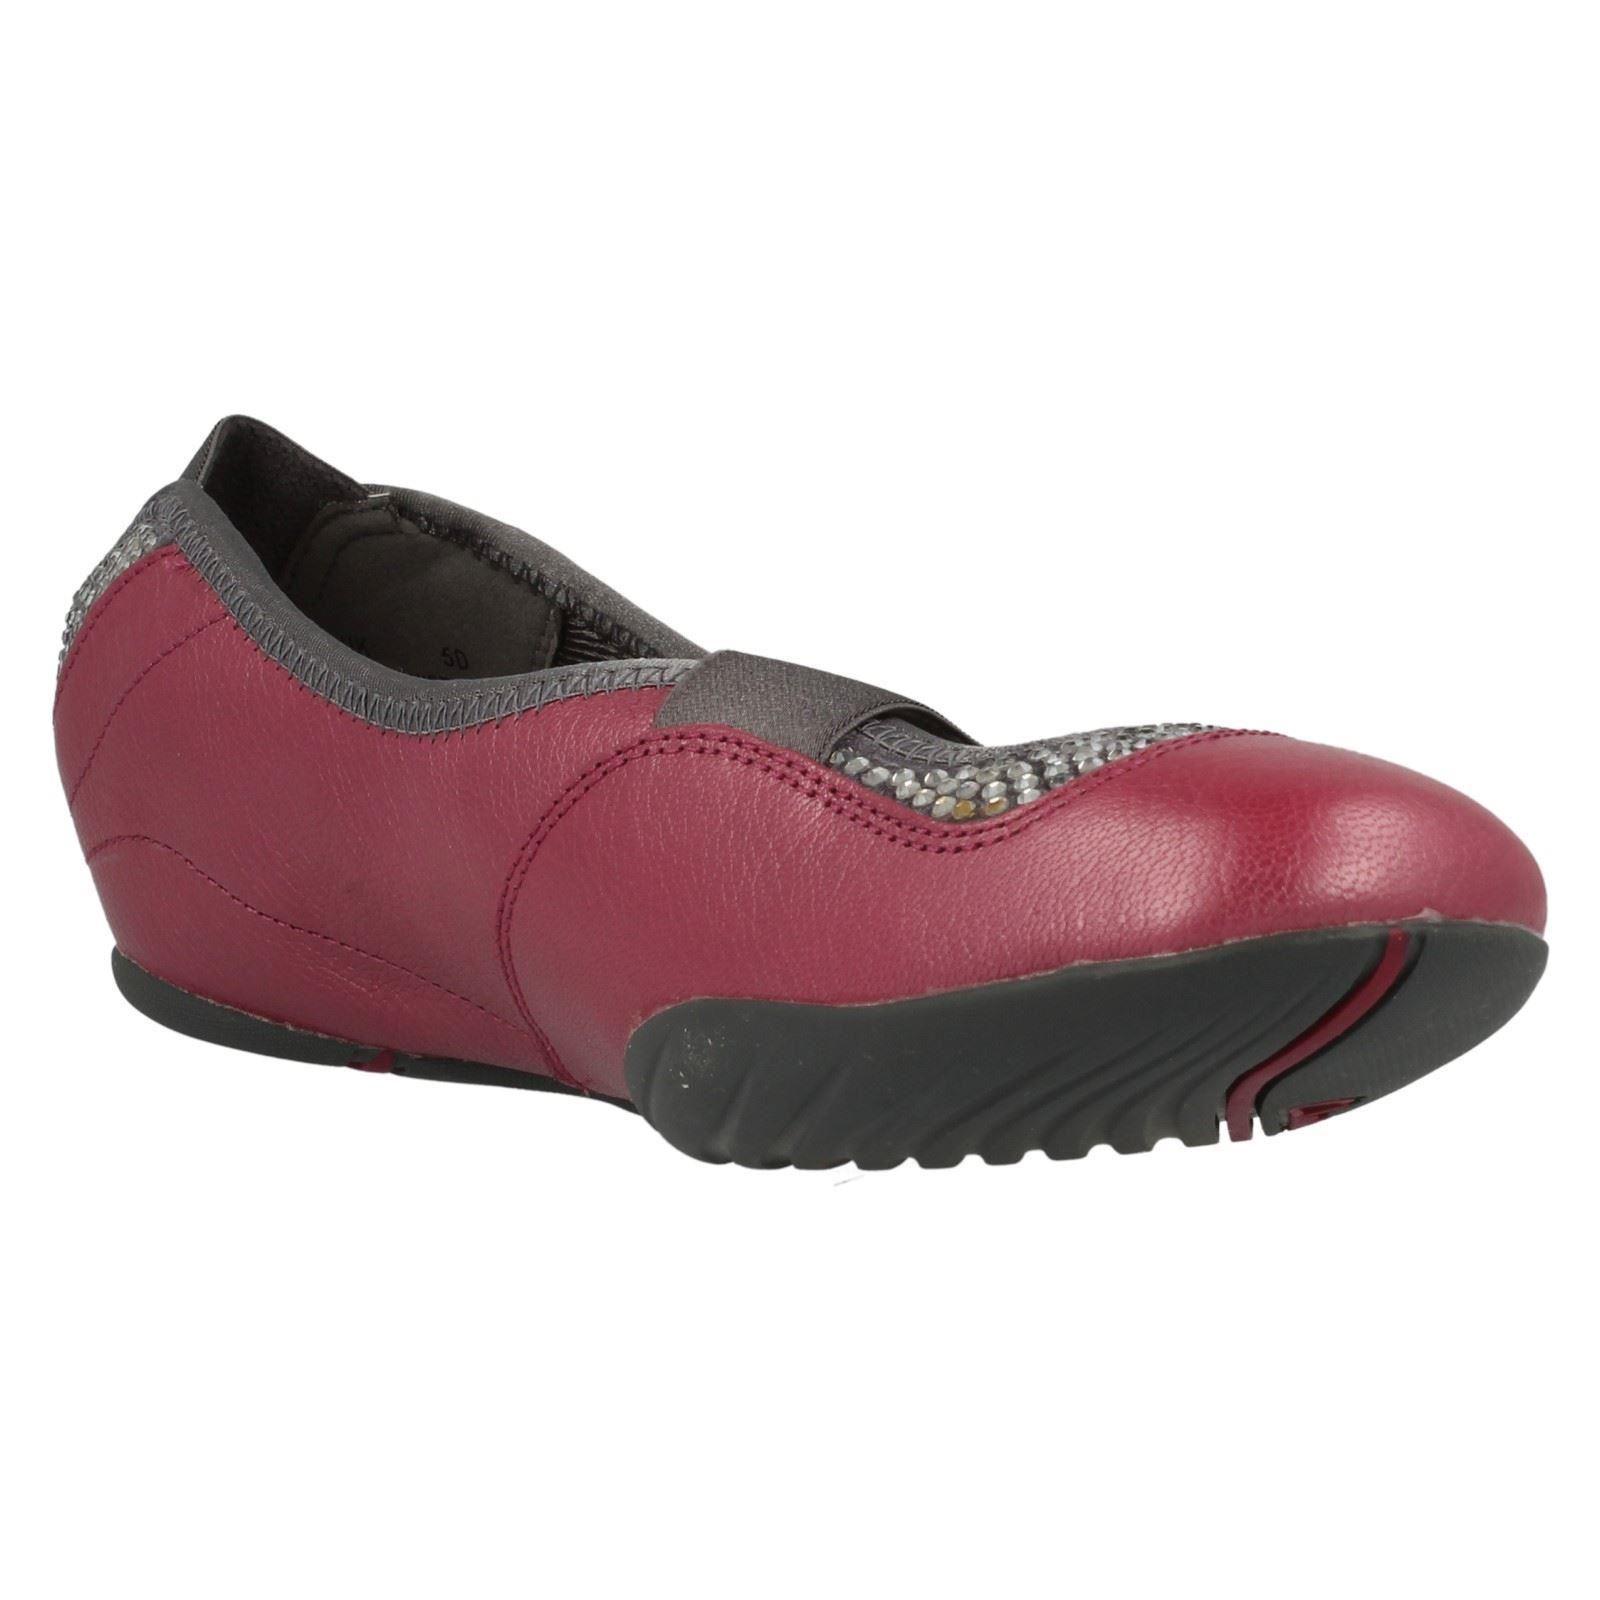 Ladies Clarks Casual Flat Shoes. Idyllic Gem | EBay